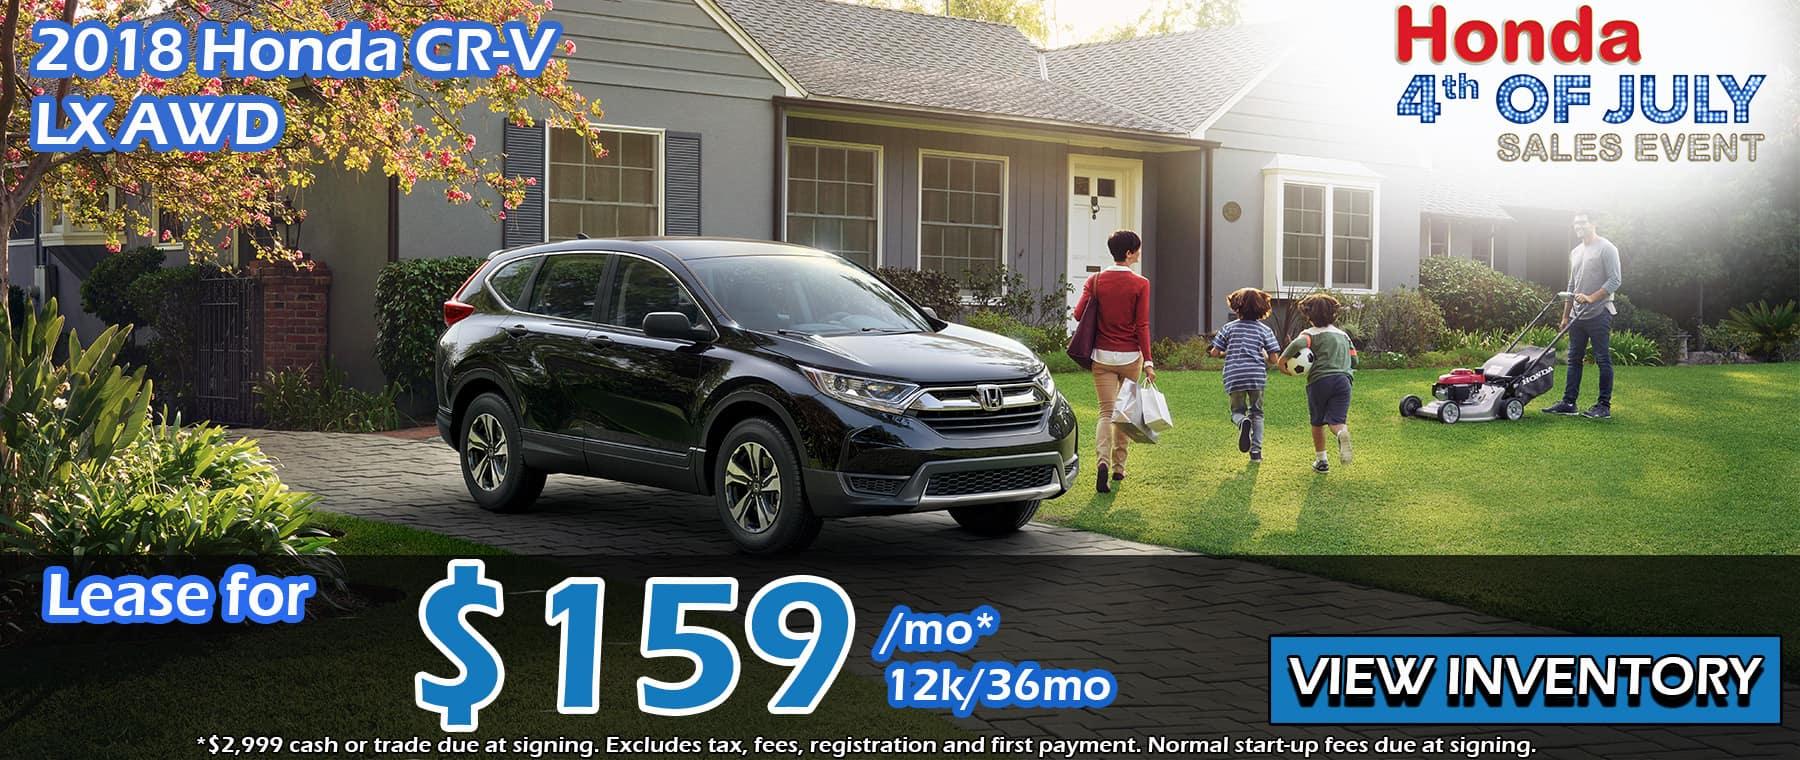 Honda Dealership Northern New Jersey - Best Jersey 2018